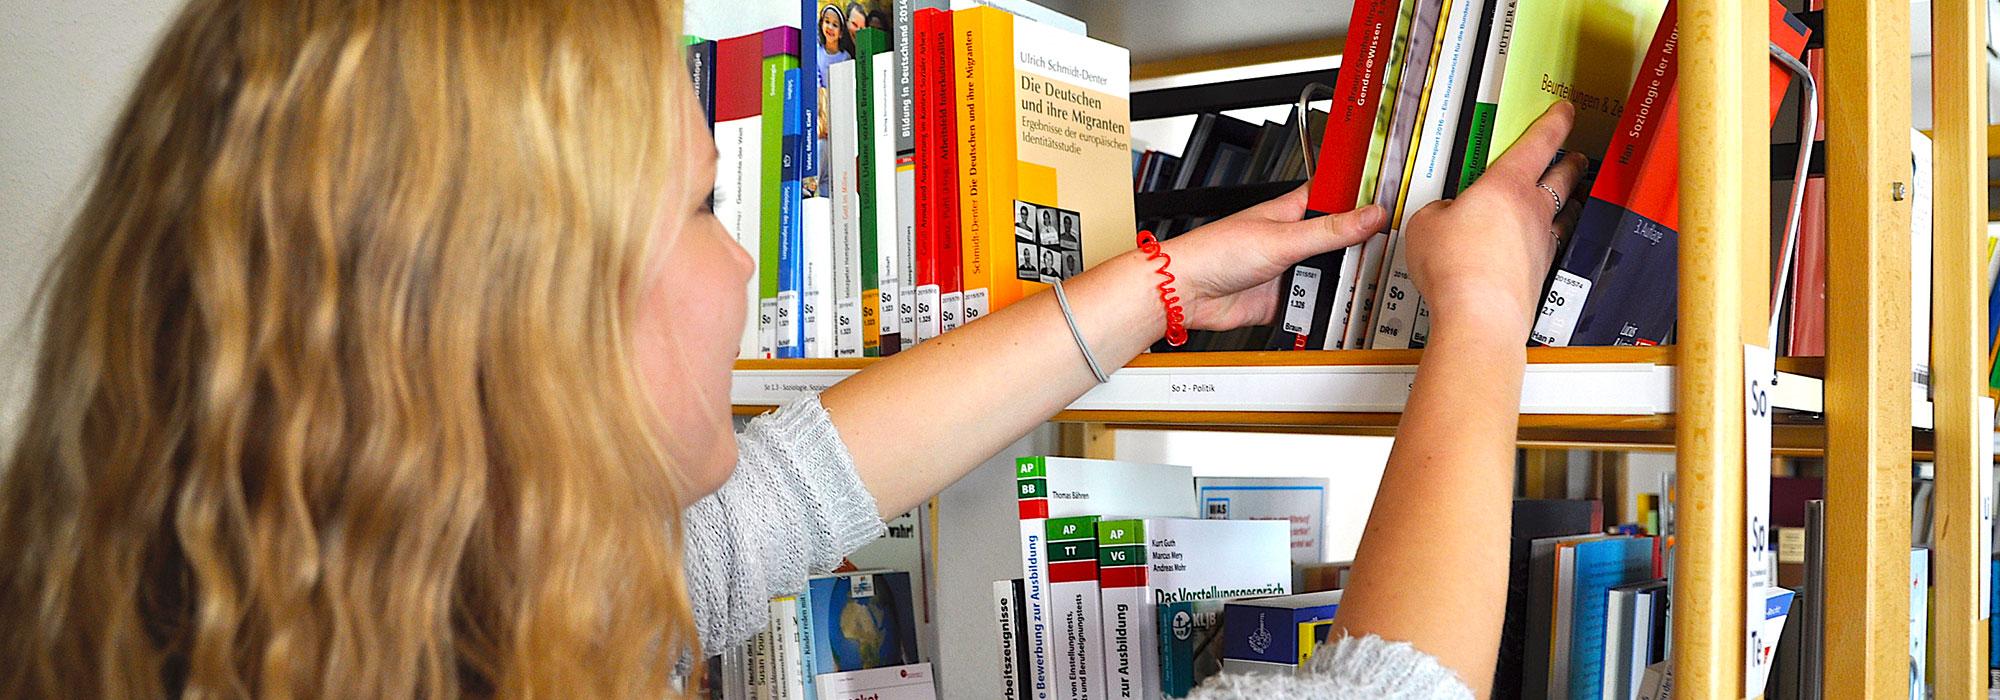 6_Bibliothek_Szene-am-Regal